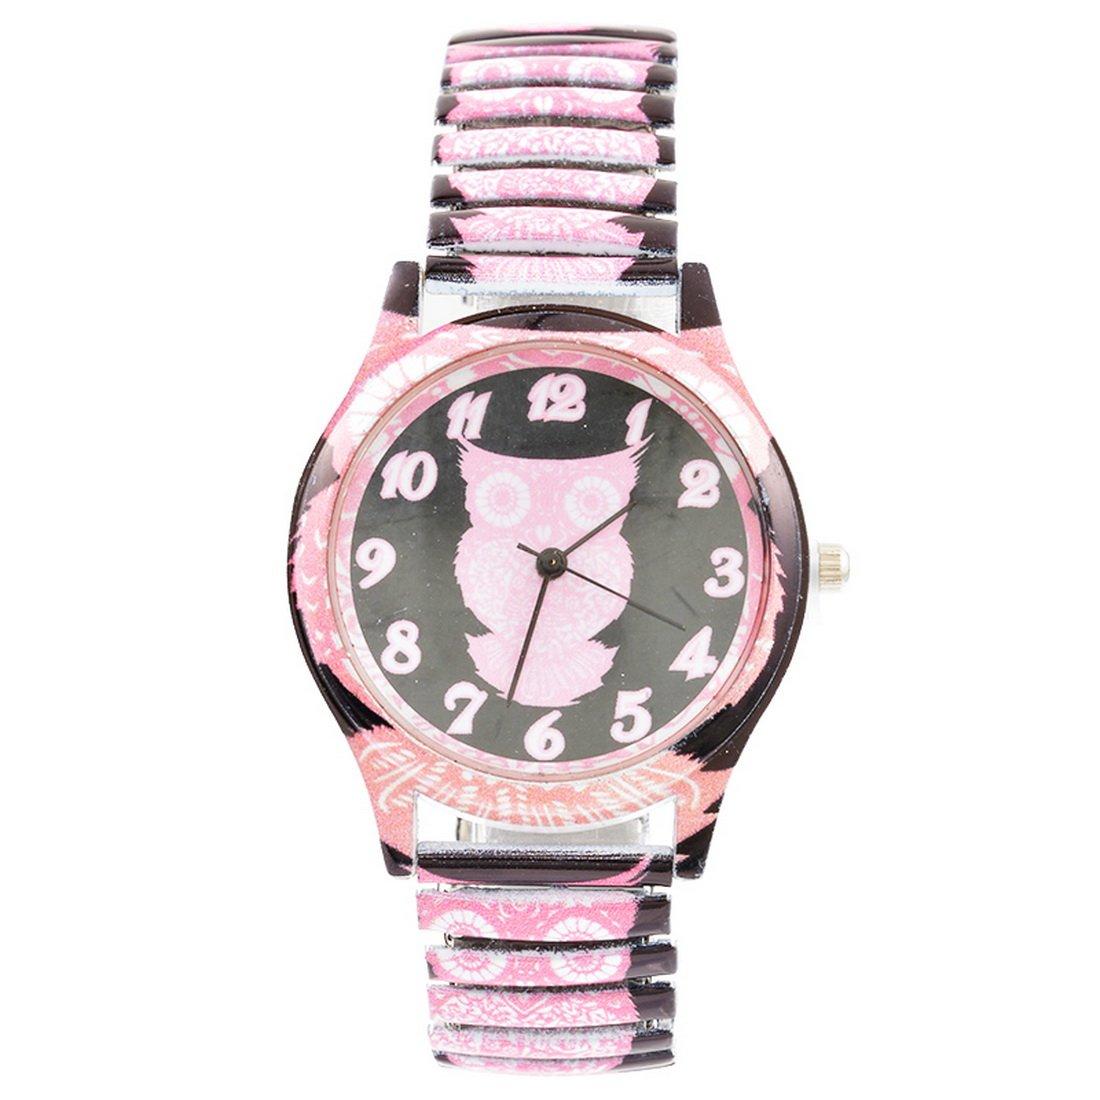 Souarts-Damen-Schwarz-Federkraft-Quartzuhr-Eule-Analog-Armreif-Uhr-mit-Batterie-Edelstahl-Armband-Armbanduhr